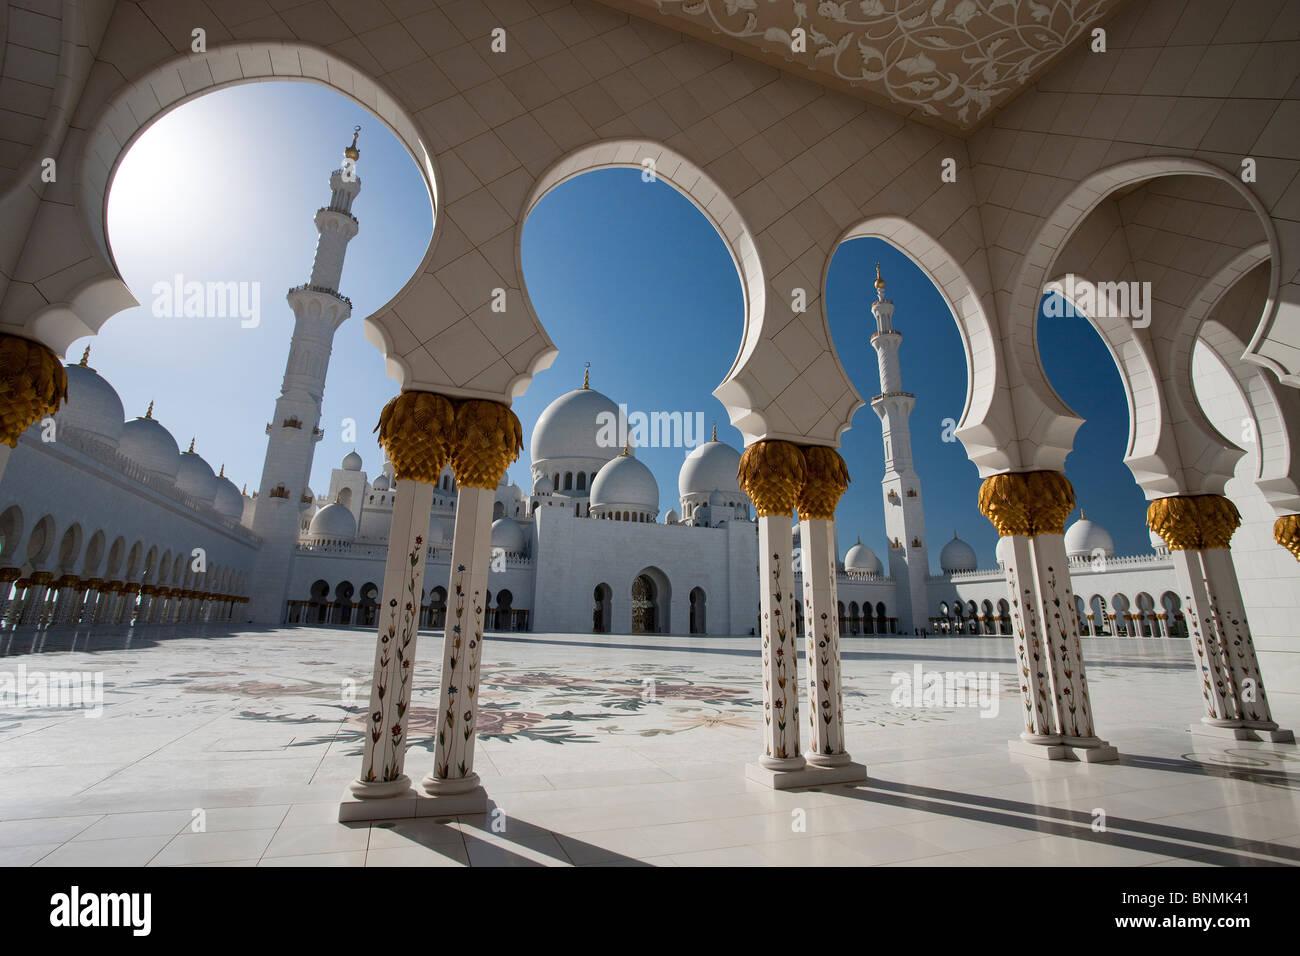 Mezquita Sheikh Zayed domos rook minarete de la mezquita Islam religión columnas Abu Dhabi EMIRATOS ARABES Imagen De Stock